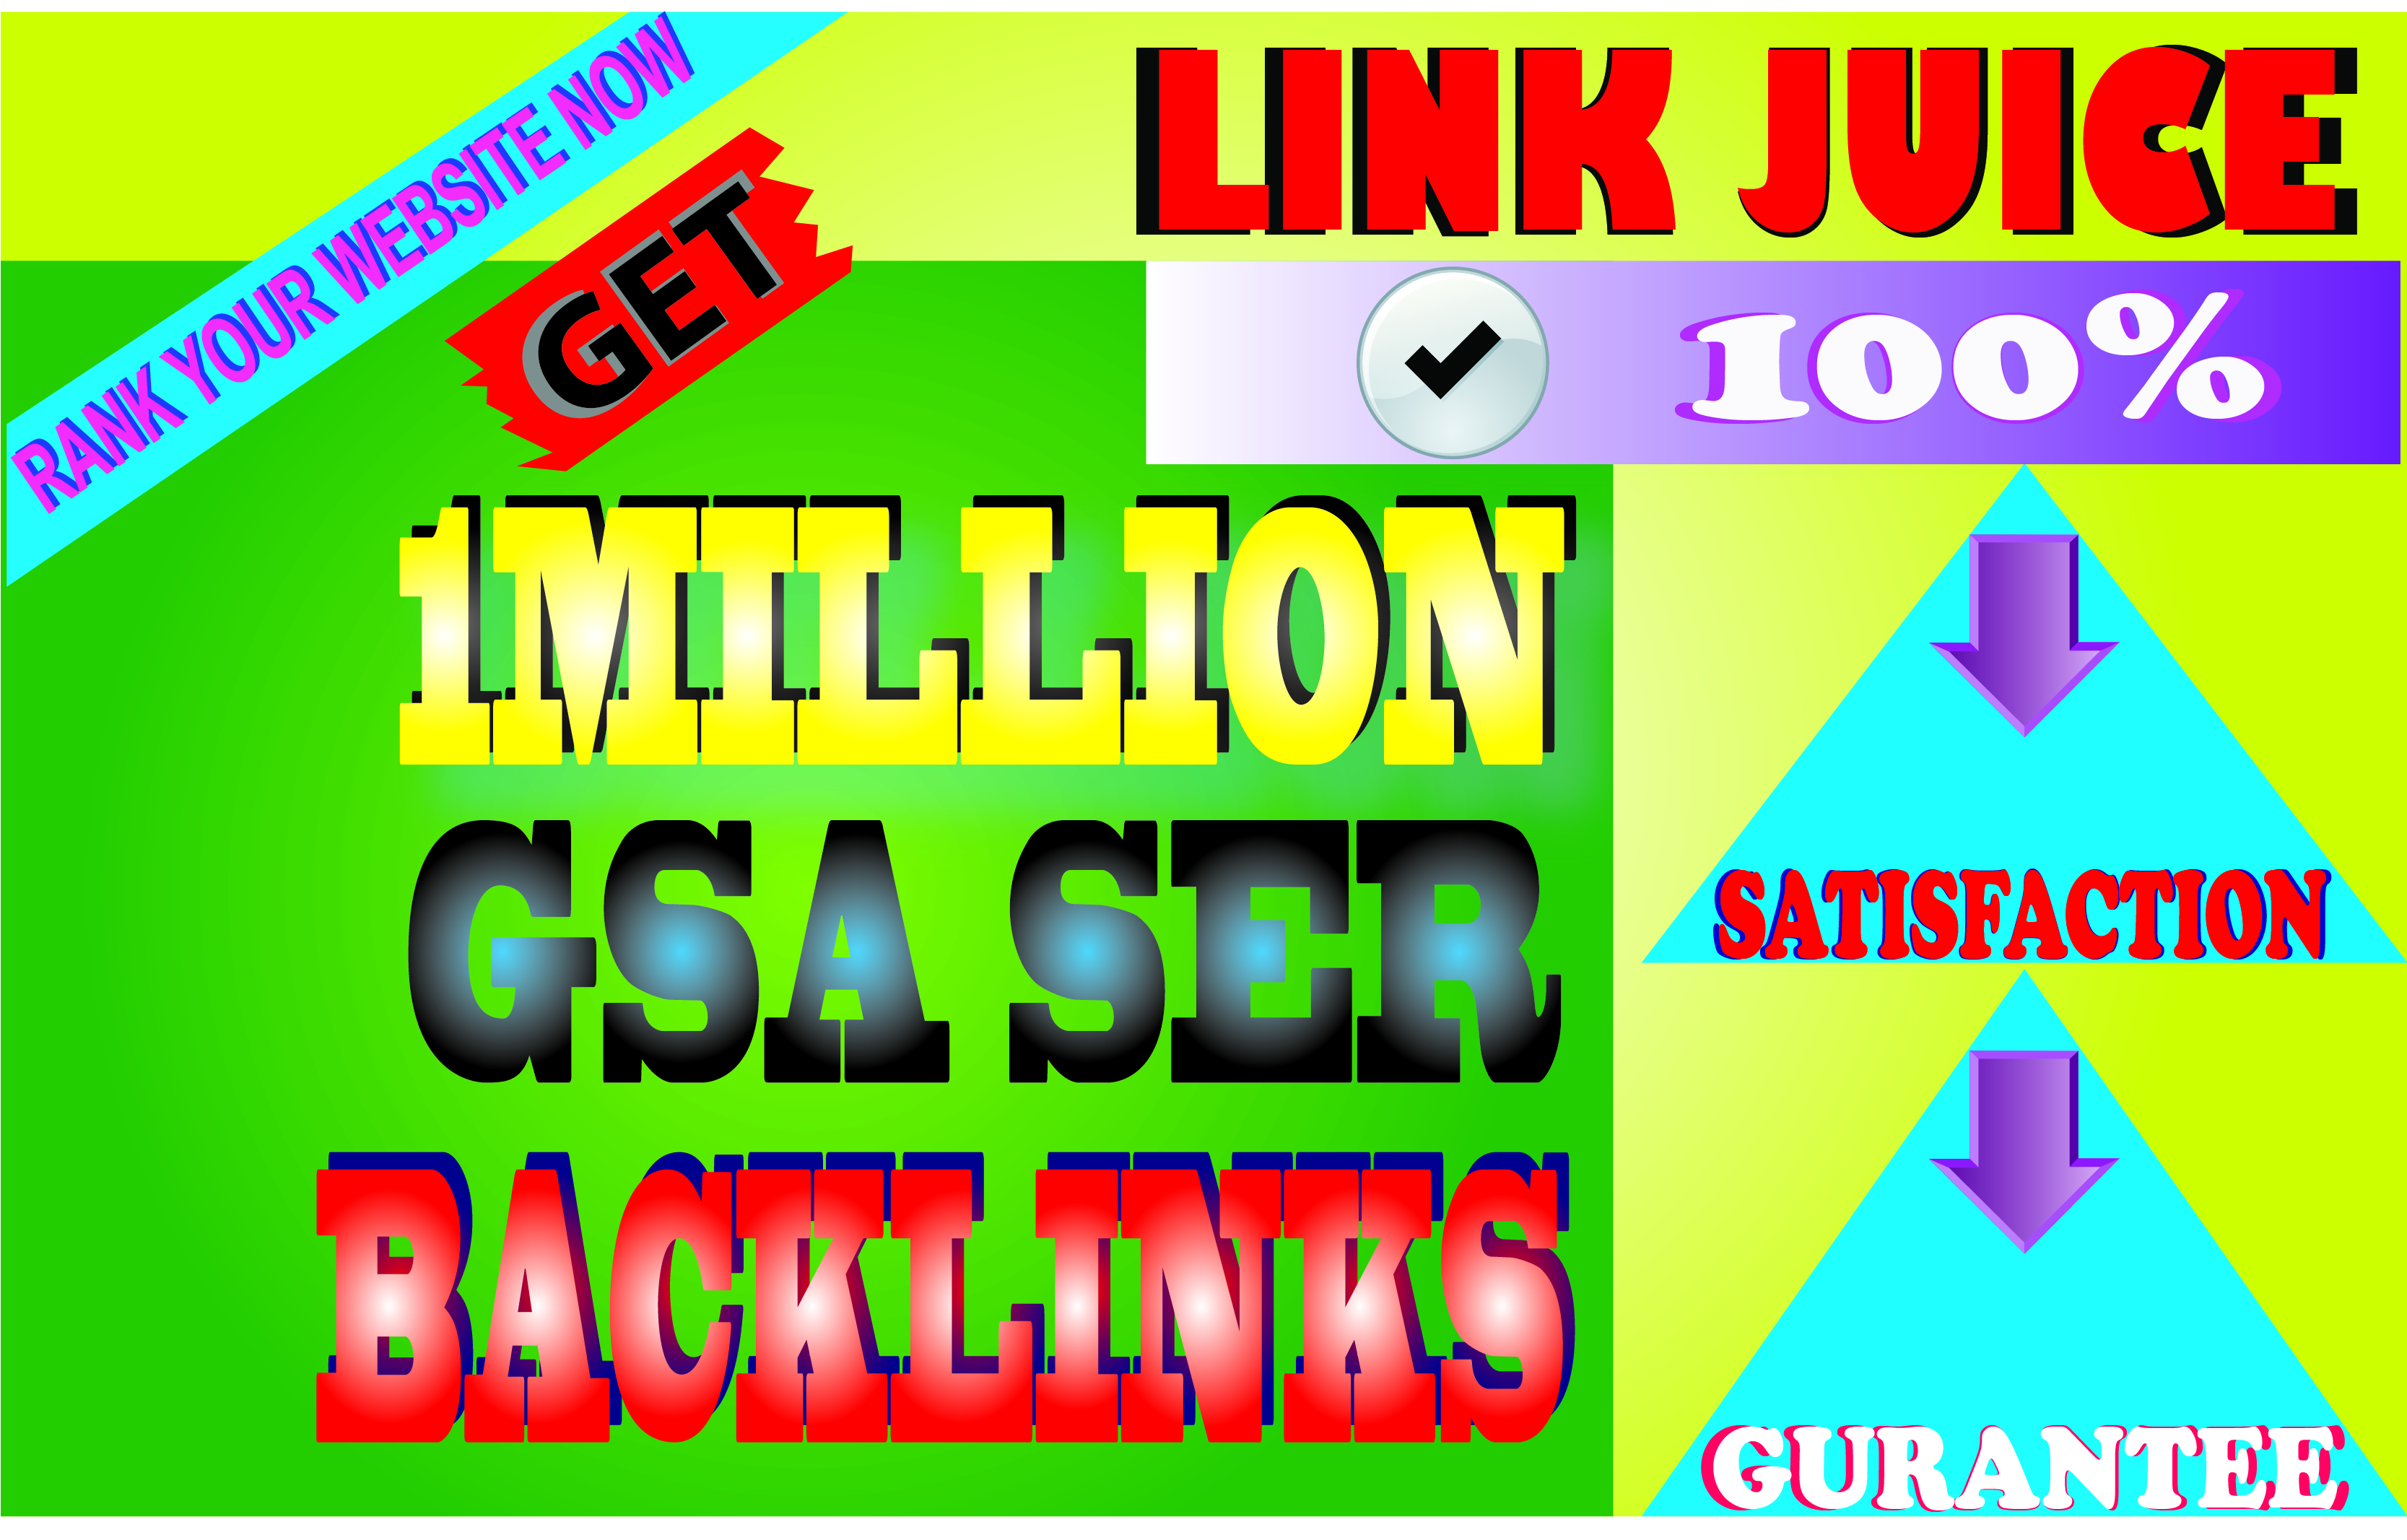 I will create 1 million gsa backlinks for increasing link juice